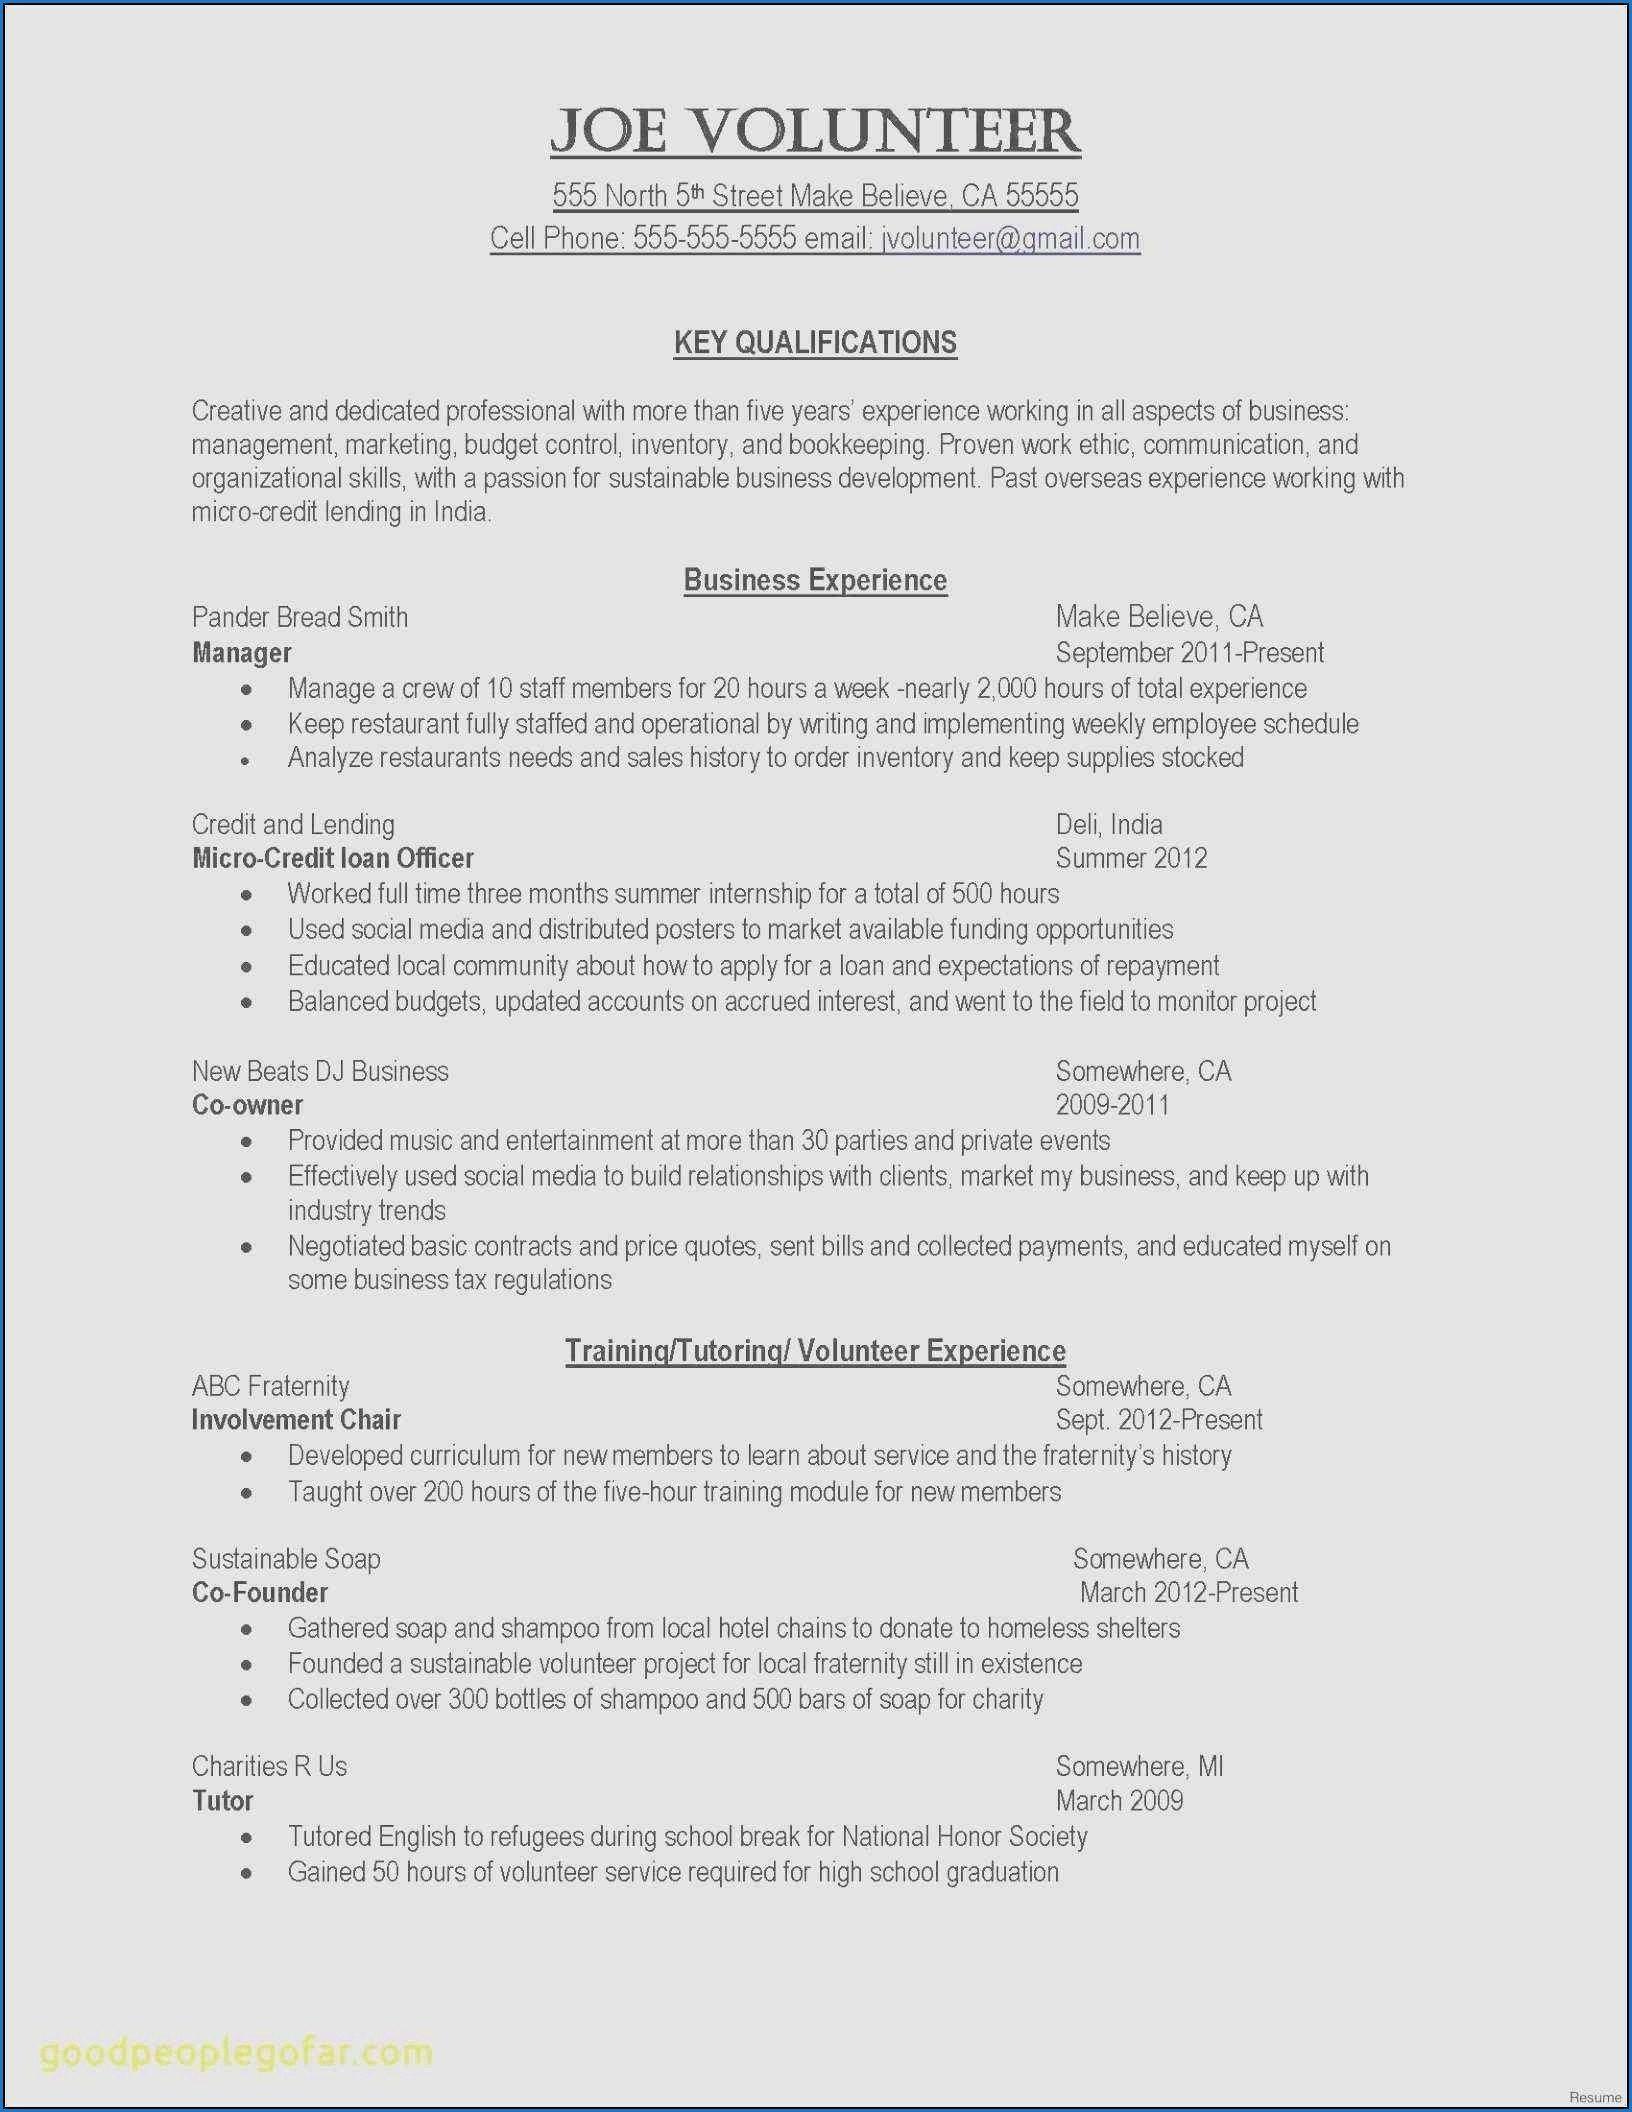 Communication Skills For Resume Awesome Social Media Skills Resume Nanny Examples Sample Samples New Resume Examples Resume Skills Job Resume Examples